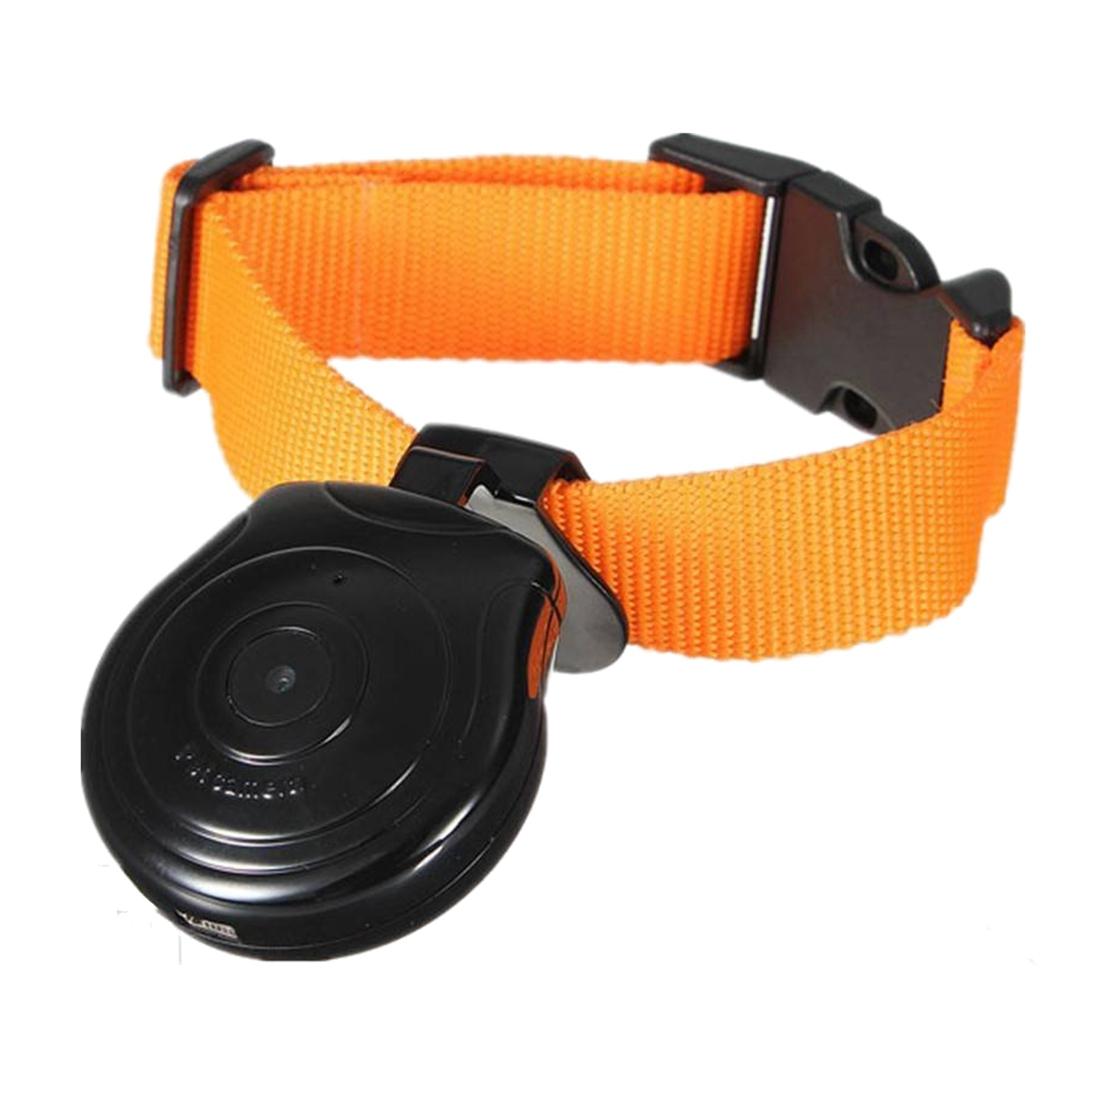 10x(Mini Digital Camera Video Recorder Camera DVR Video Recorder dog collar Q7R1